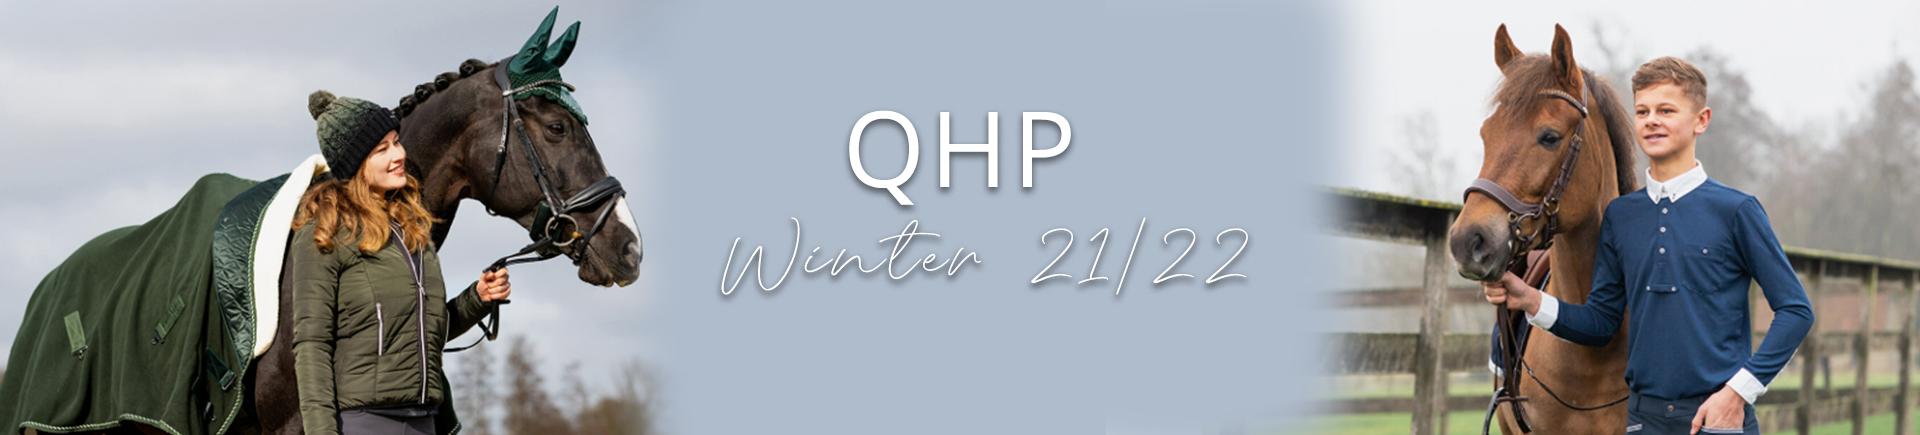 QHP 2021 wintercollectie